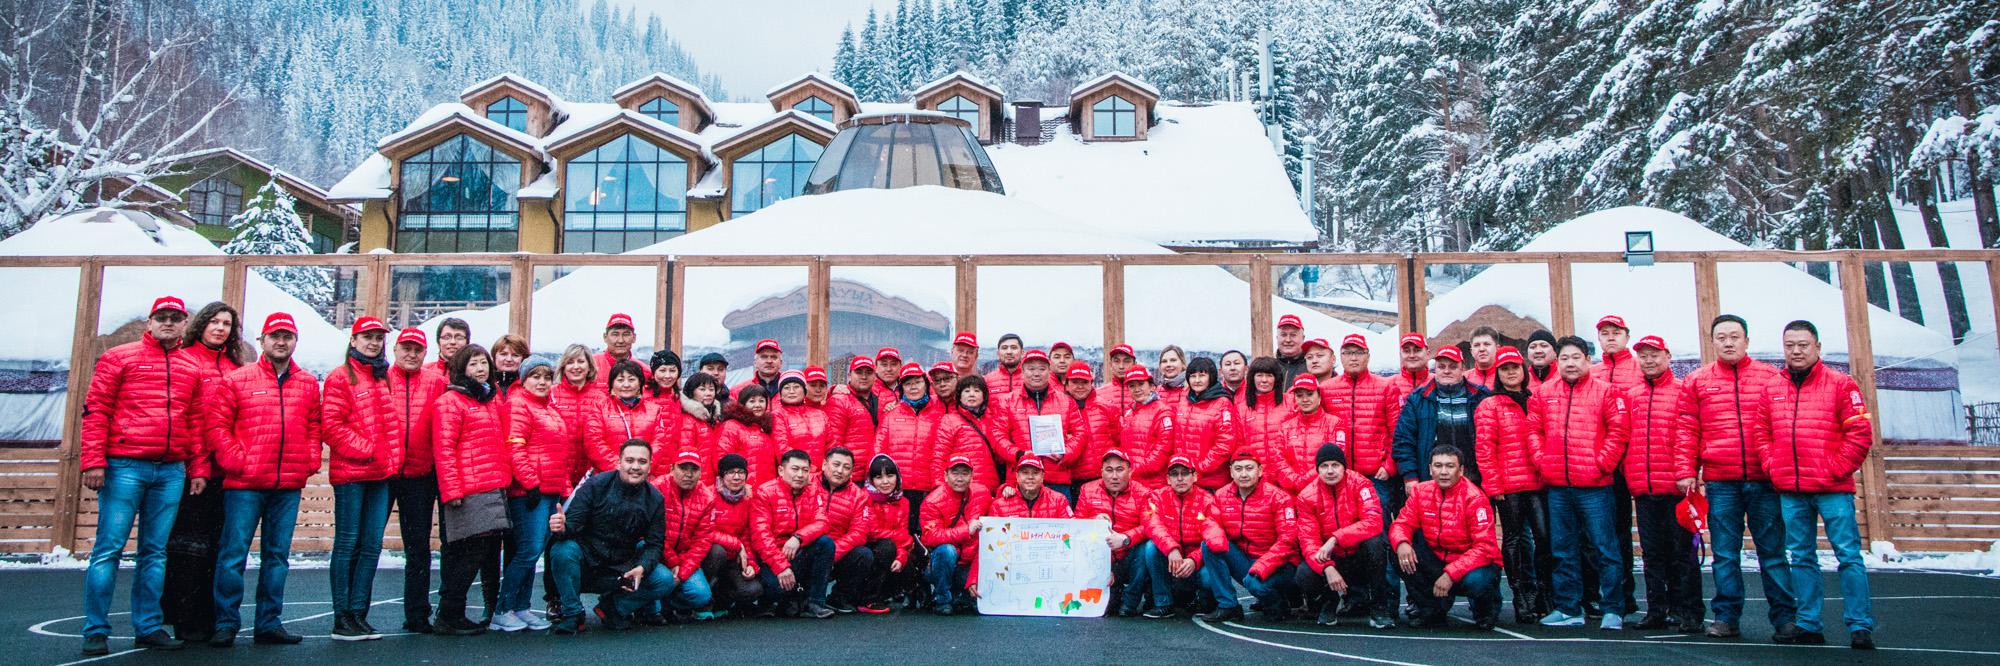 Команда «Шин-Лайн» готовится к «горячему» сезону